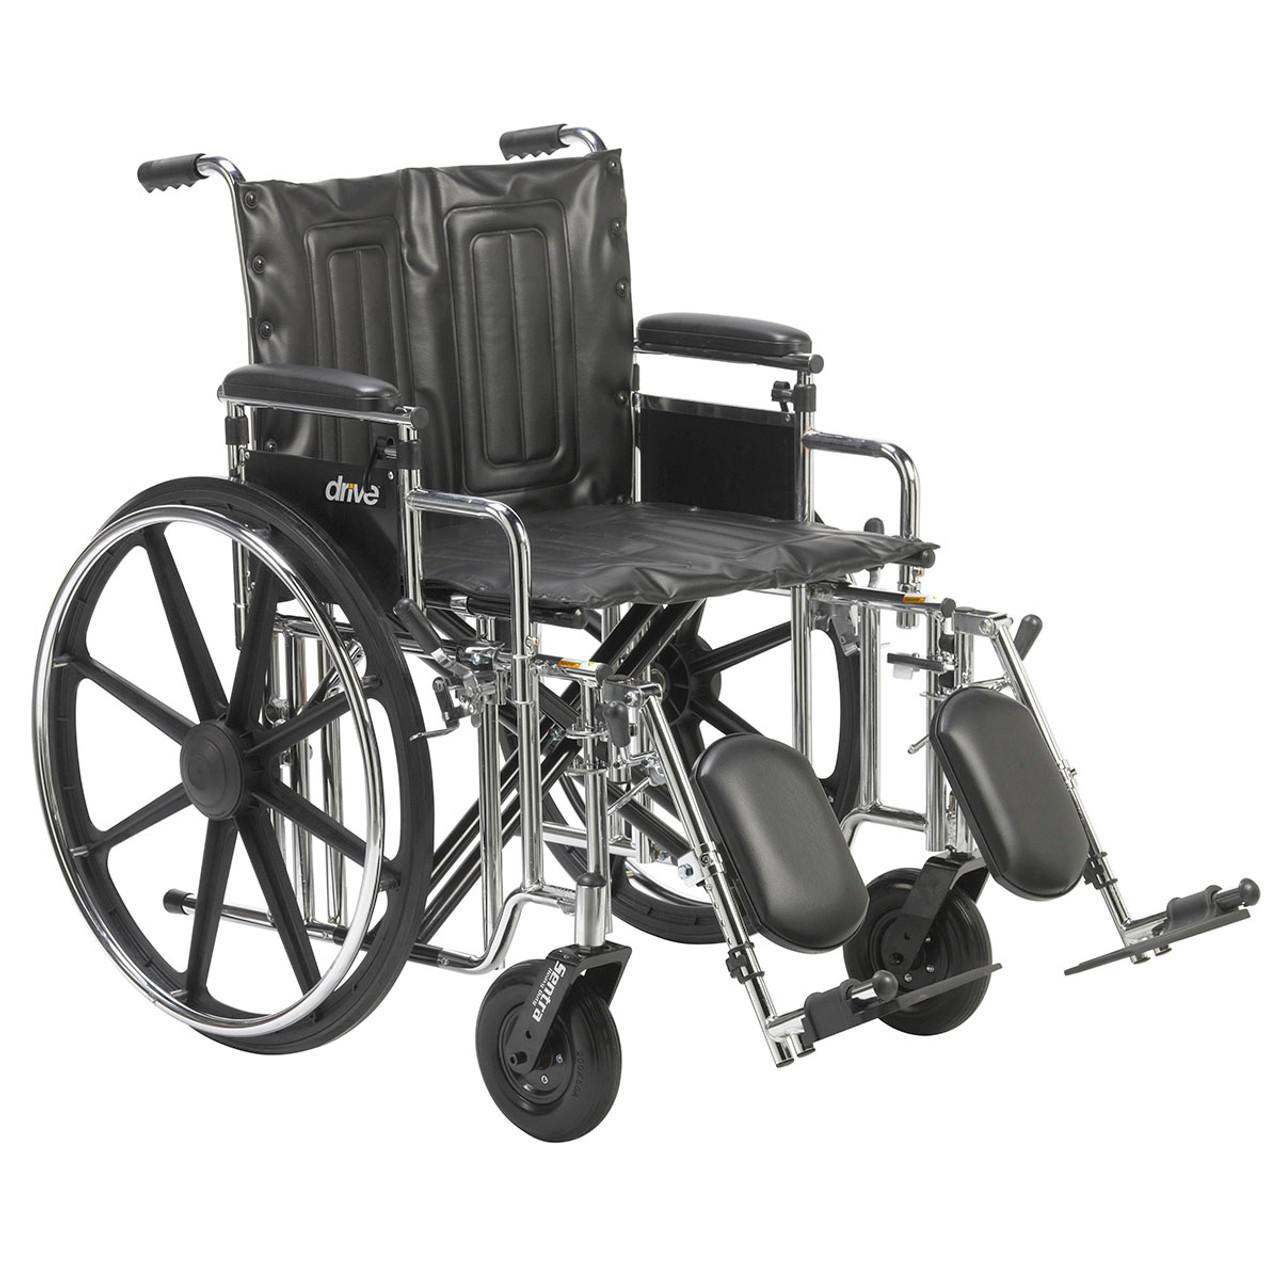 Pleasant Sentra Extra Heavy Duty Wheelchair Detachable Adjustable Height Desk Arms Elevating Leg Rests 20 Seat Machost Co Dining Chair Design Ideas Machostcouk